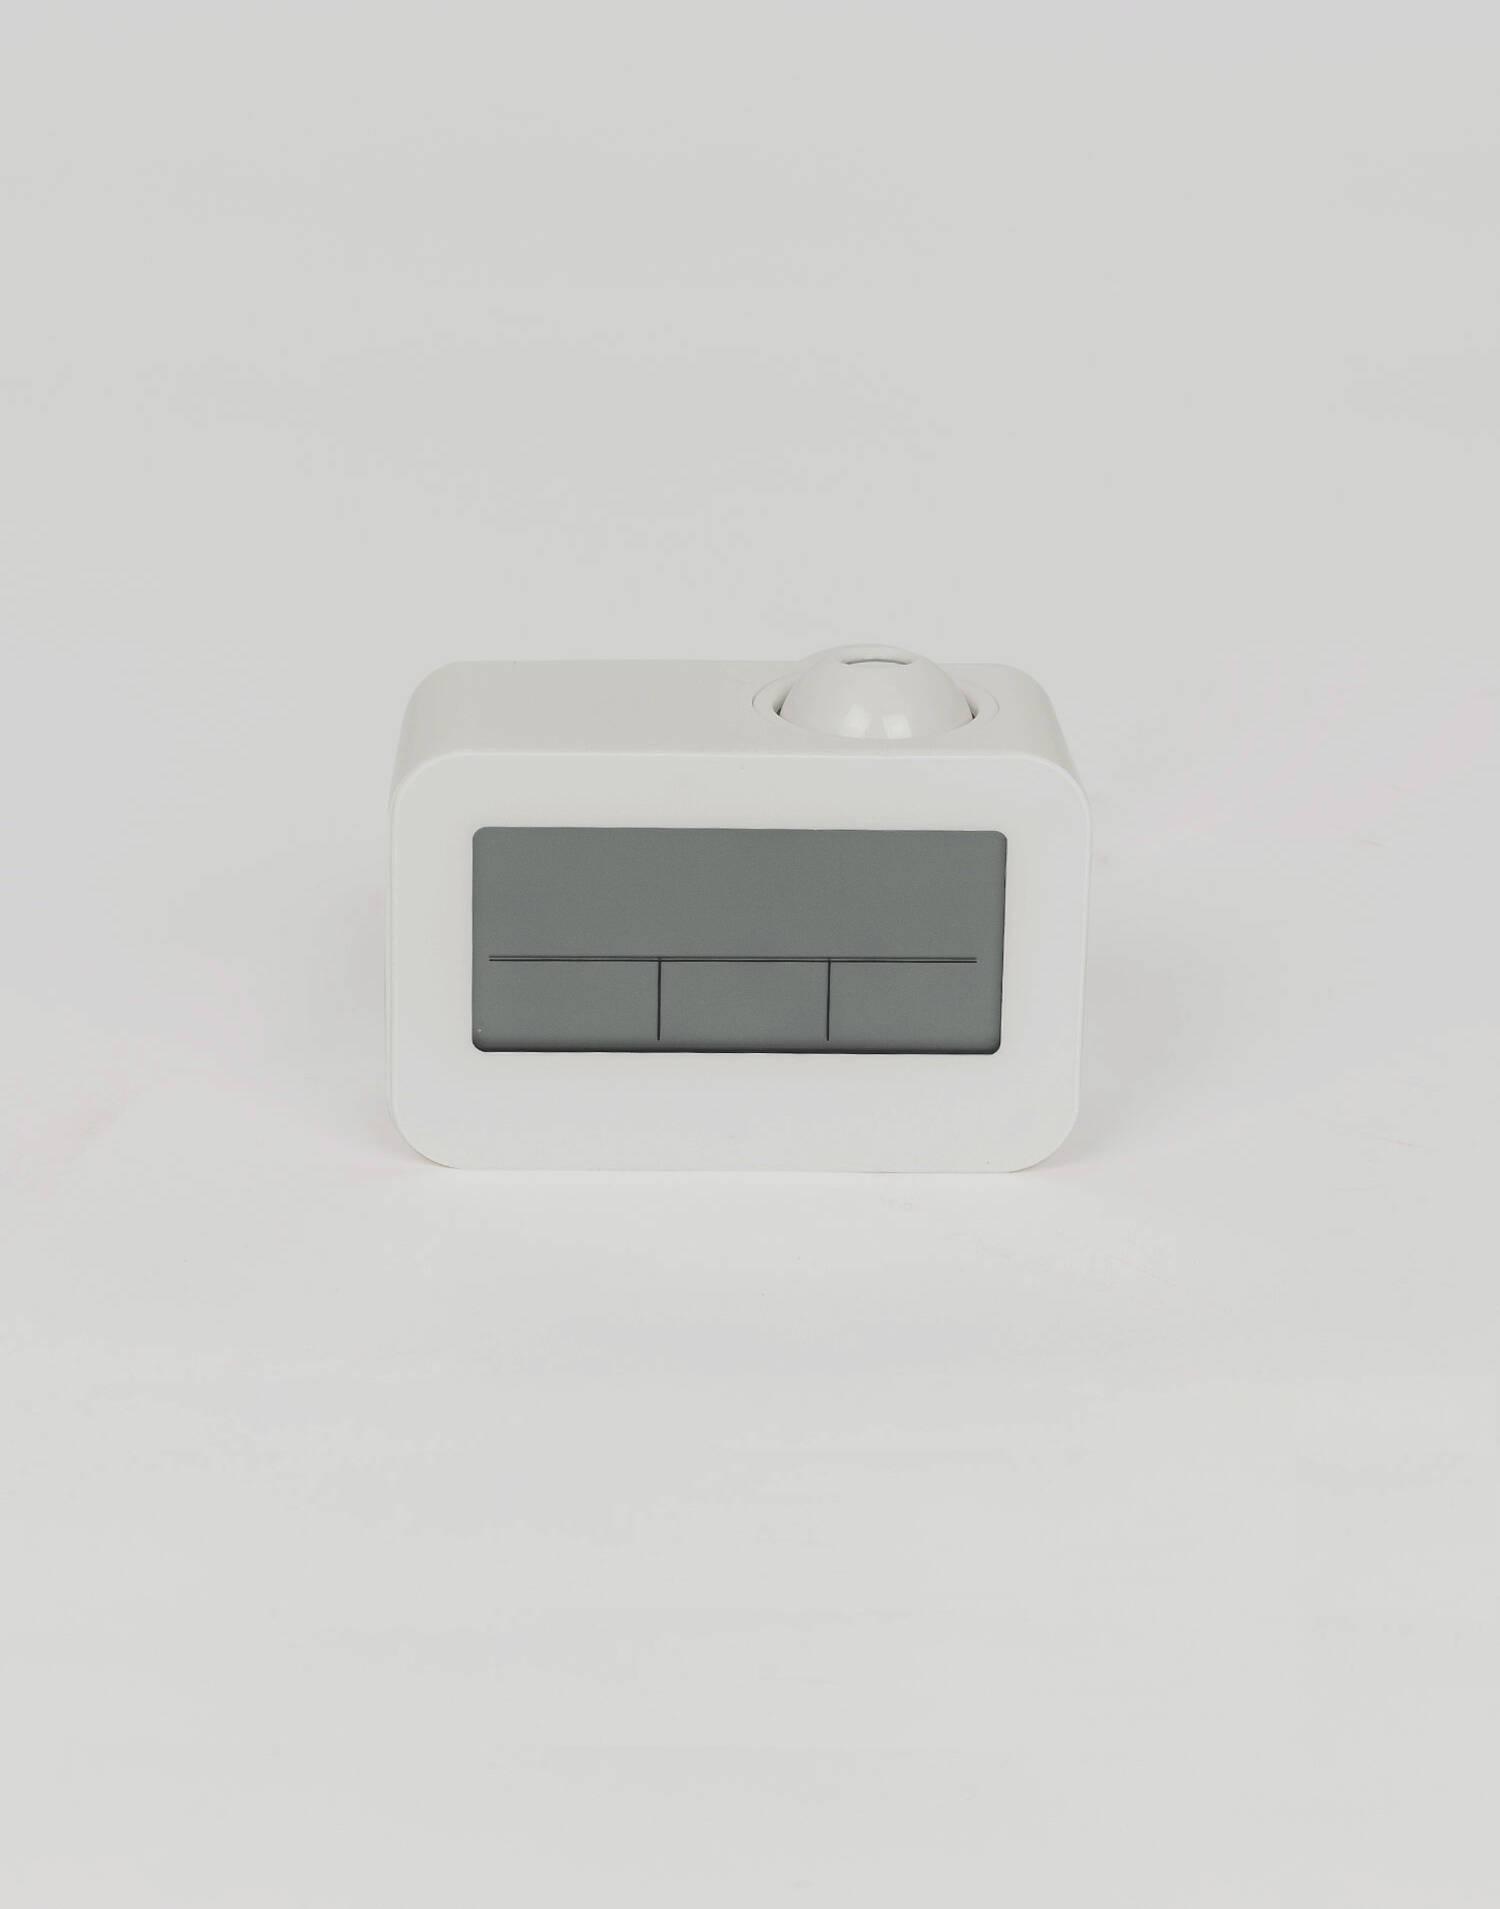 Alarm clock with projector